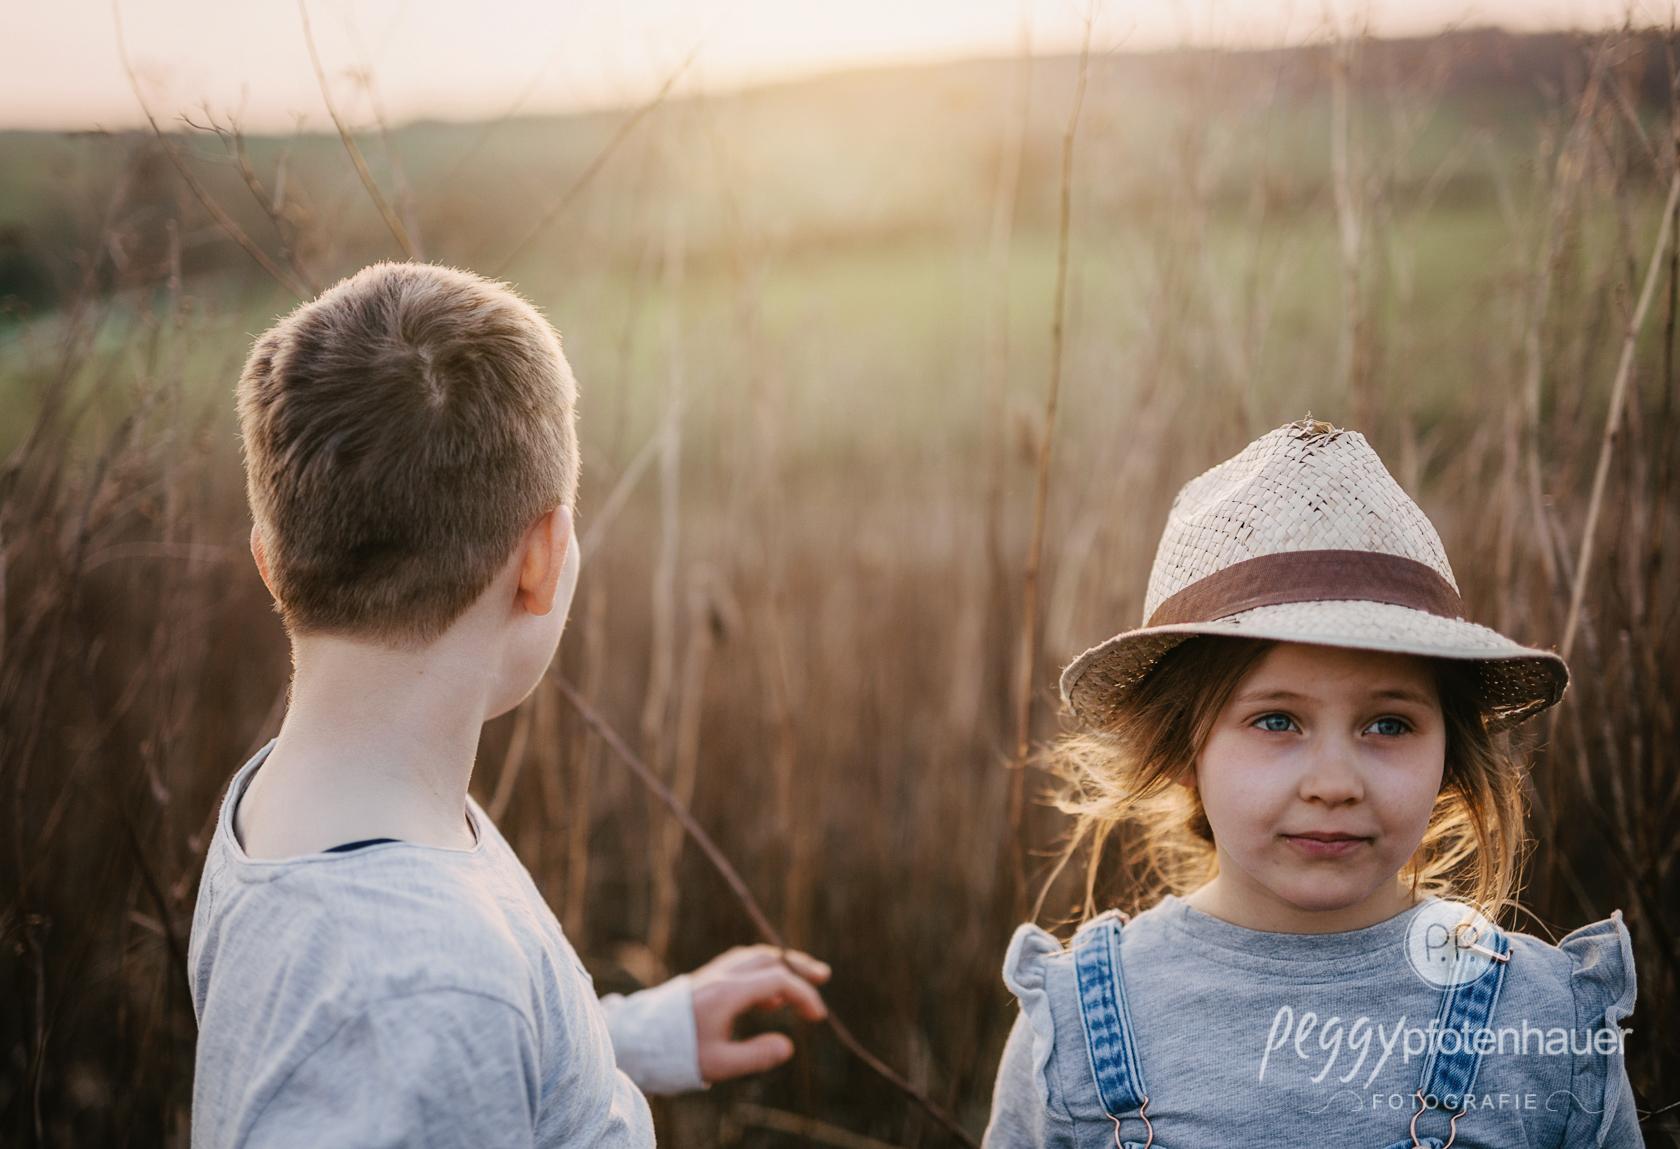 Kinder in der Natur fotografieren